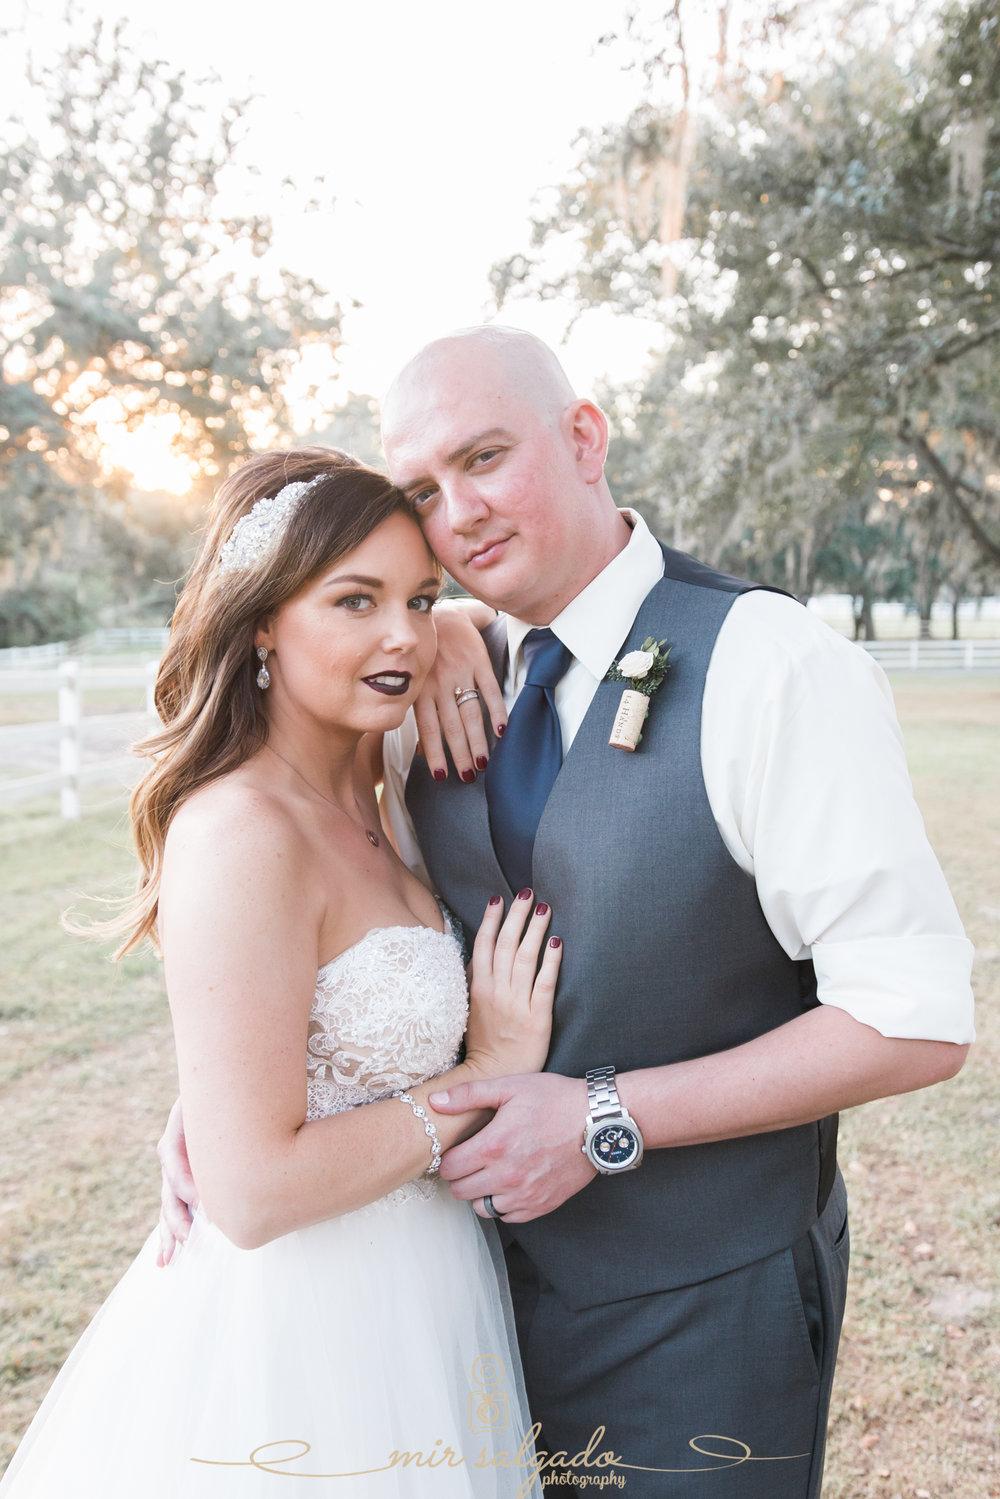 The-Lange-farm-wedding-photo, bride-and-groom-portrait